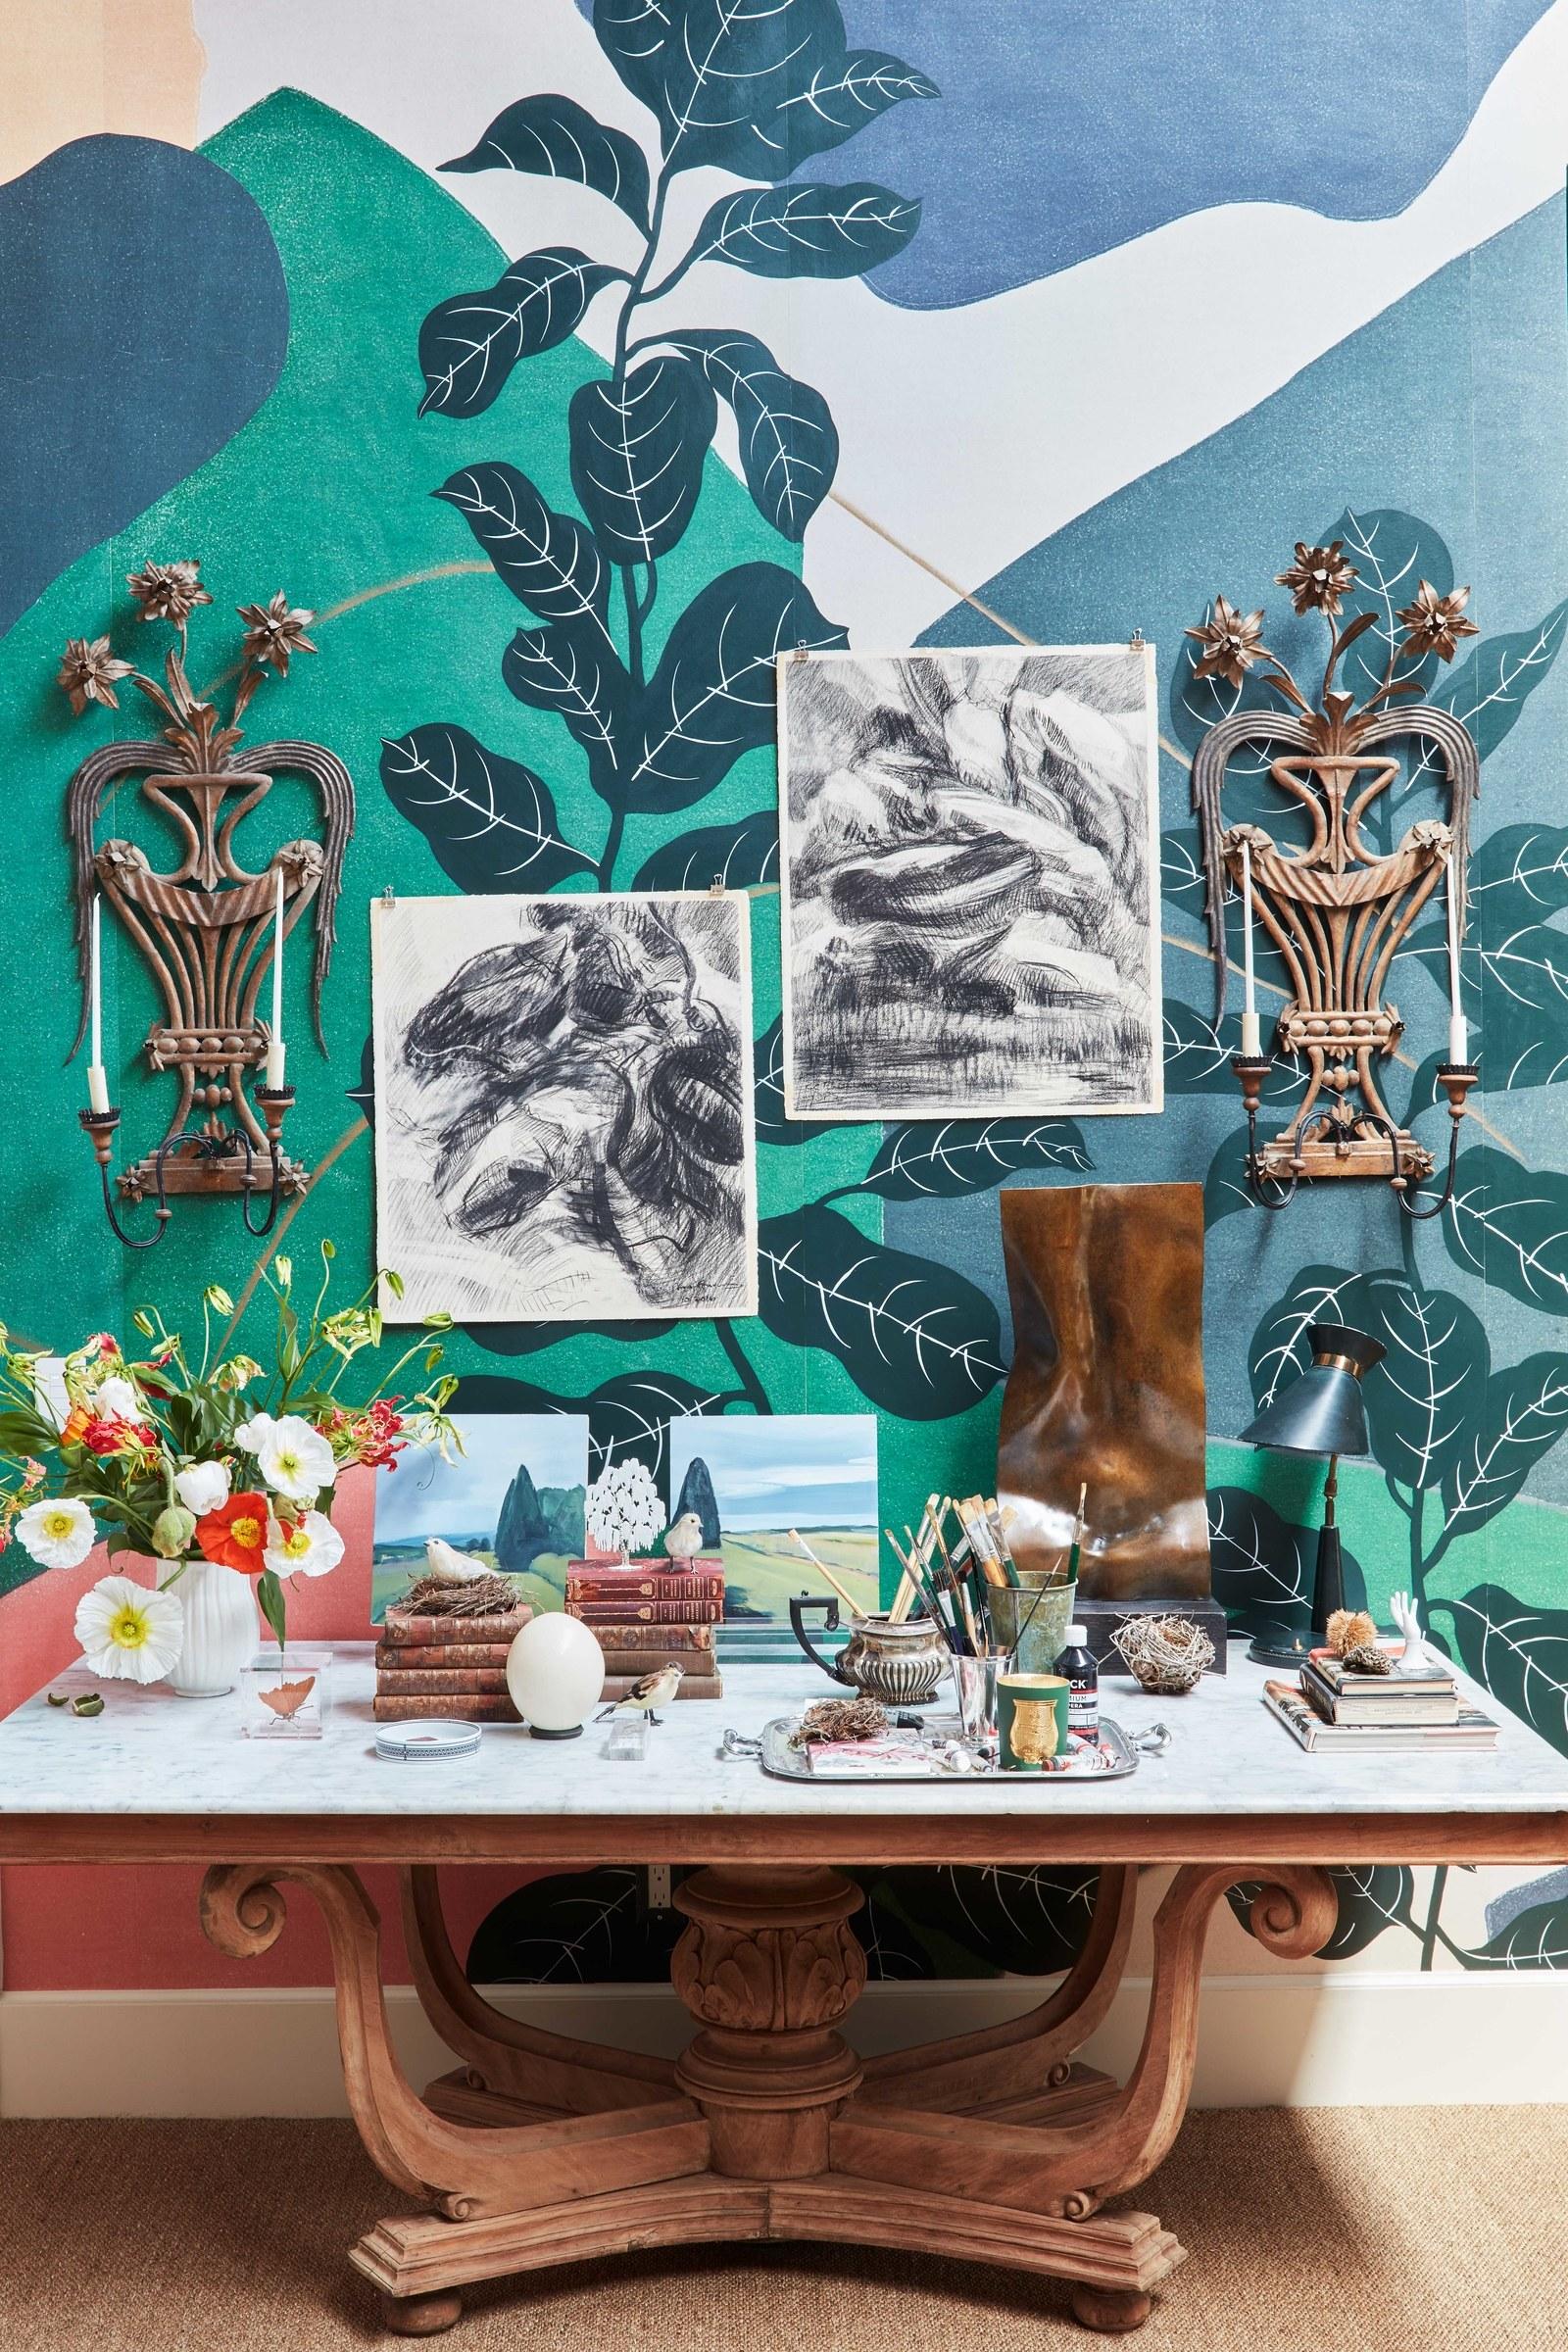 Interior by Young Huh, Photo by Ngoc Minh Ngo